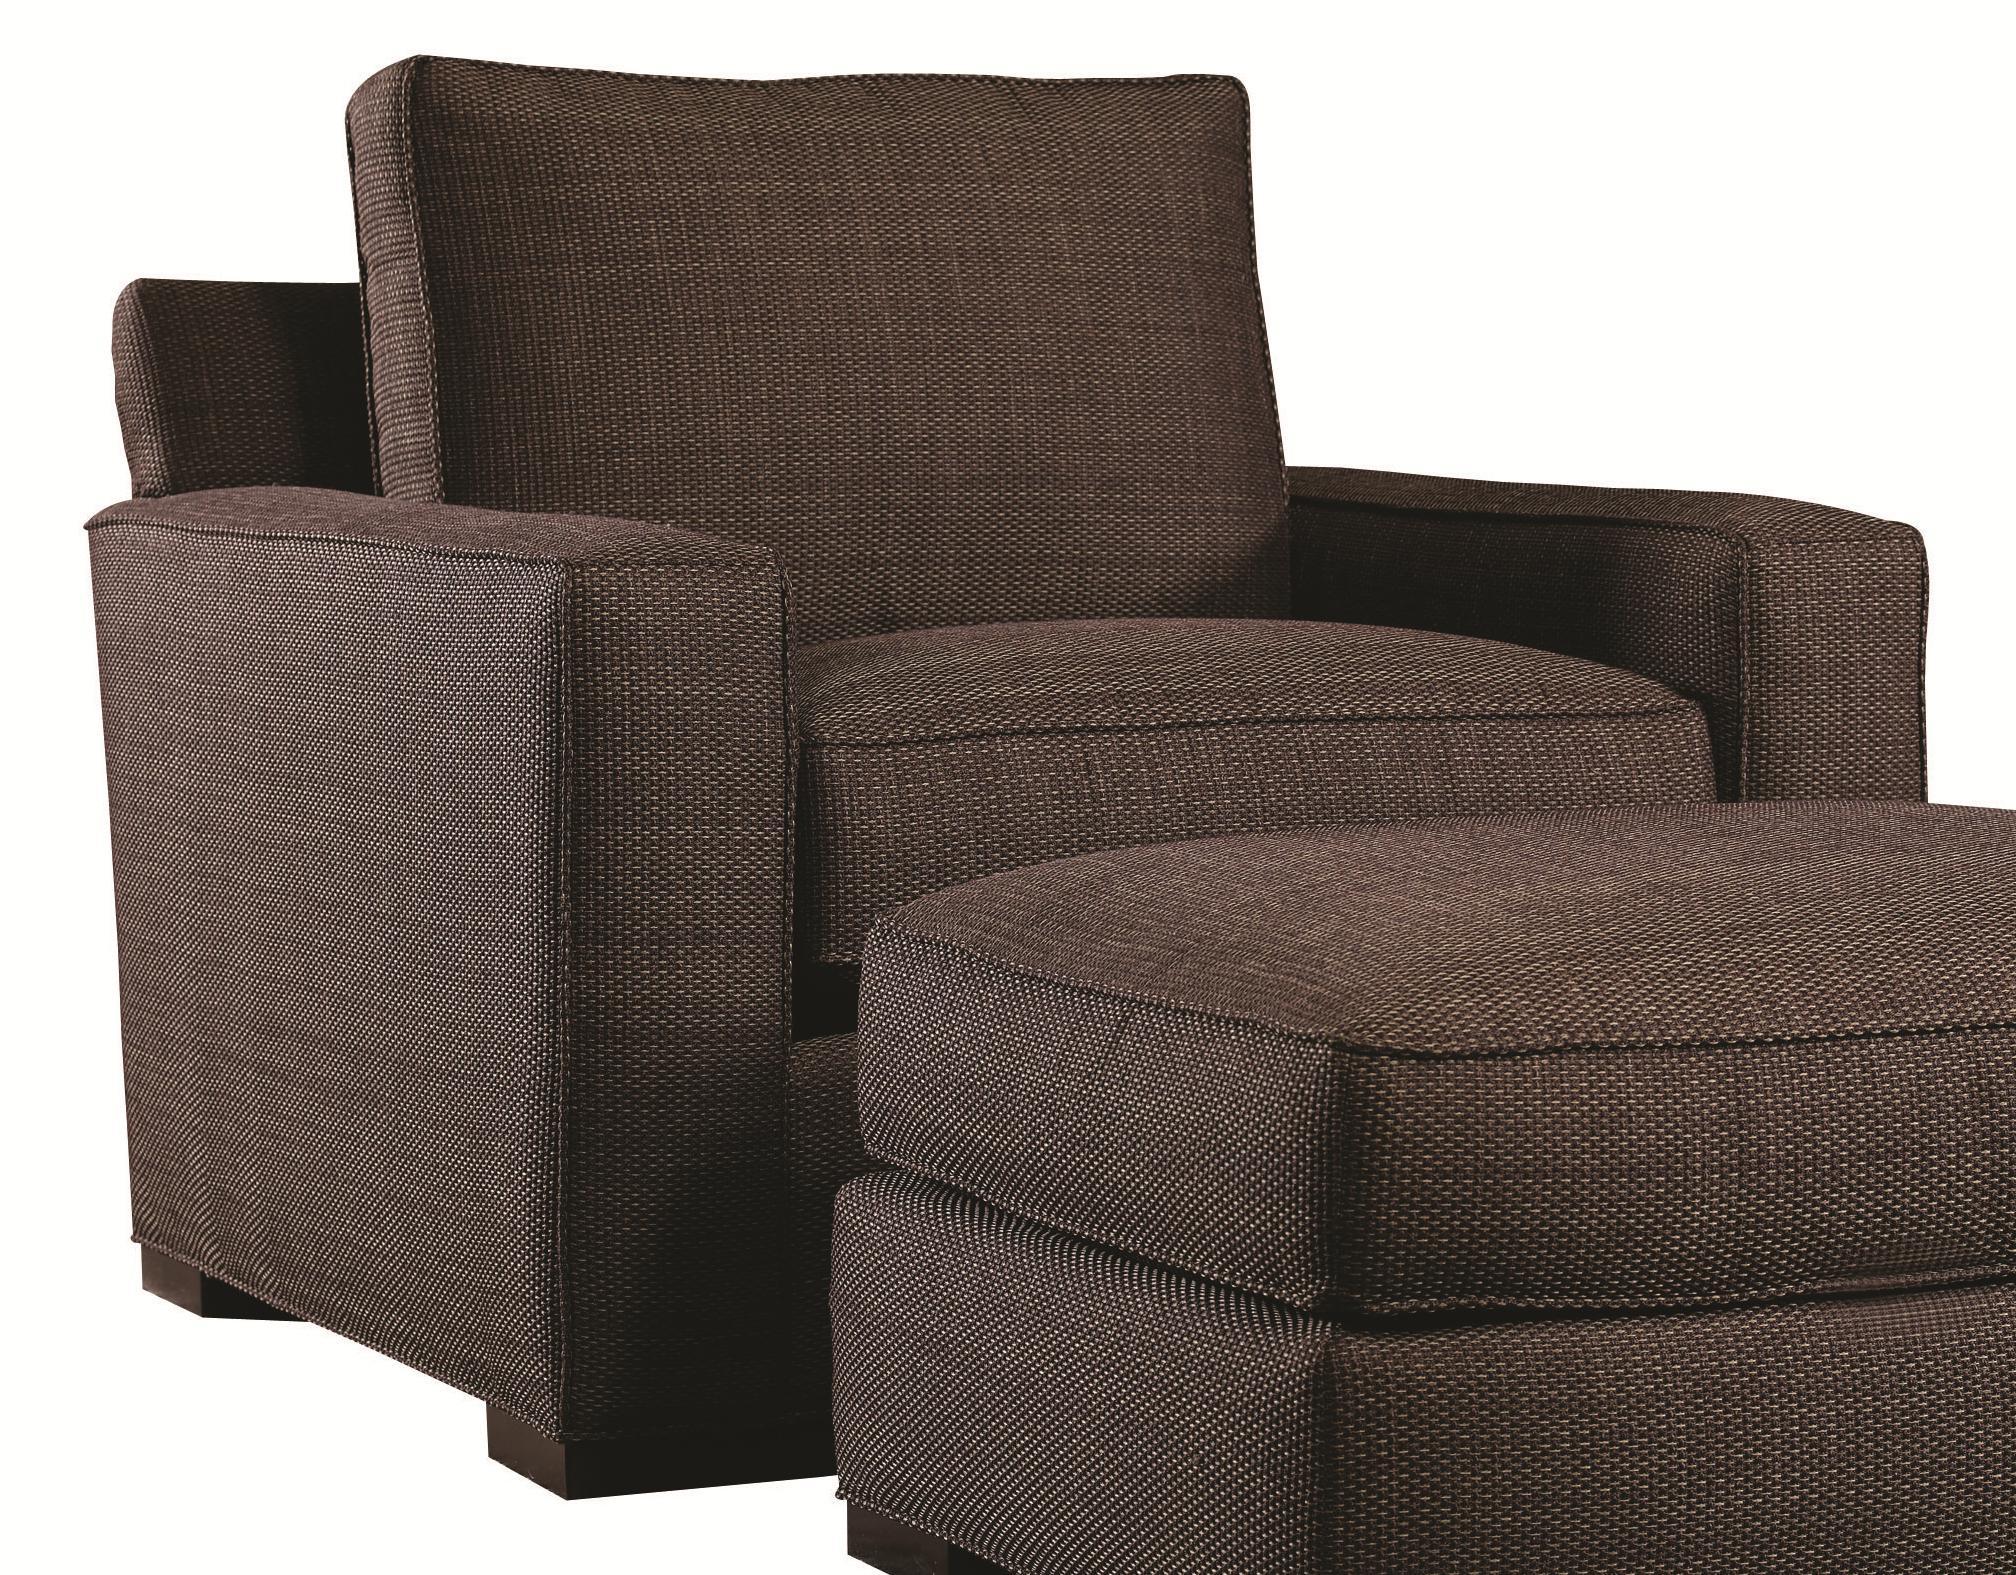 Urban Spaces - Bond Chair by Lexington at Baer's Furniture